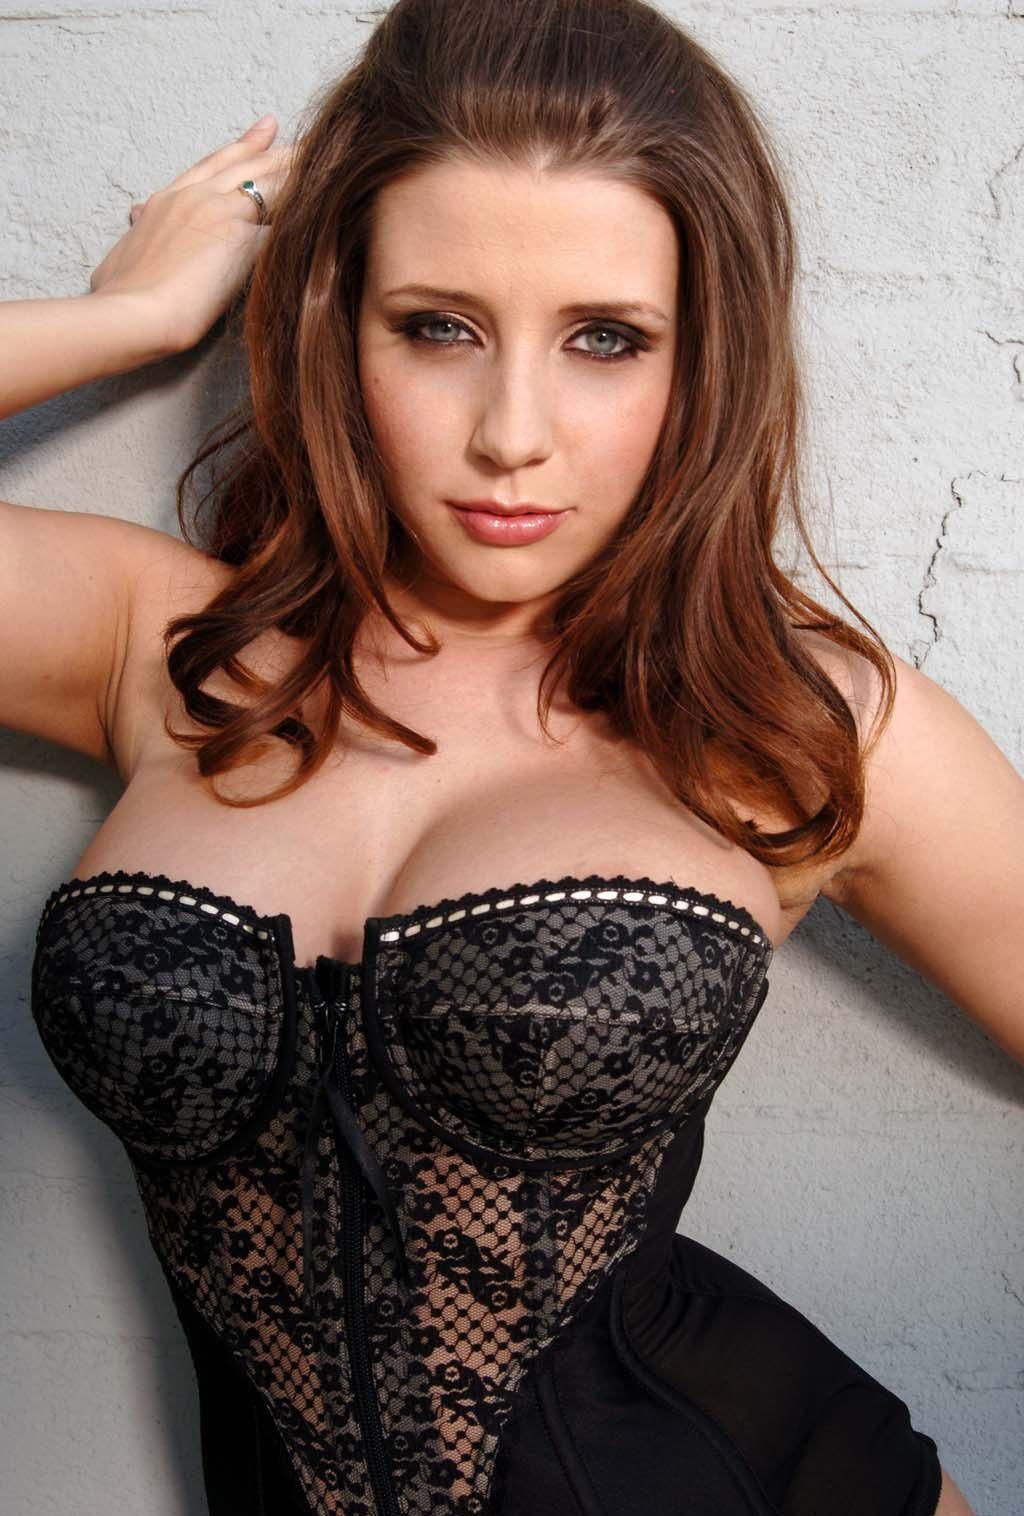 Essence Atkins Boobs pertaining to erica campbell | erica campbell | pinterest | erica campbell and woman